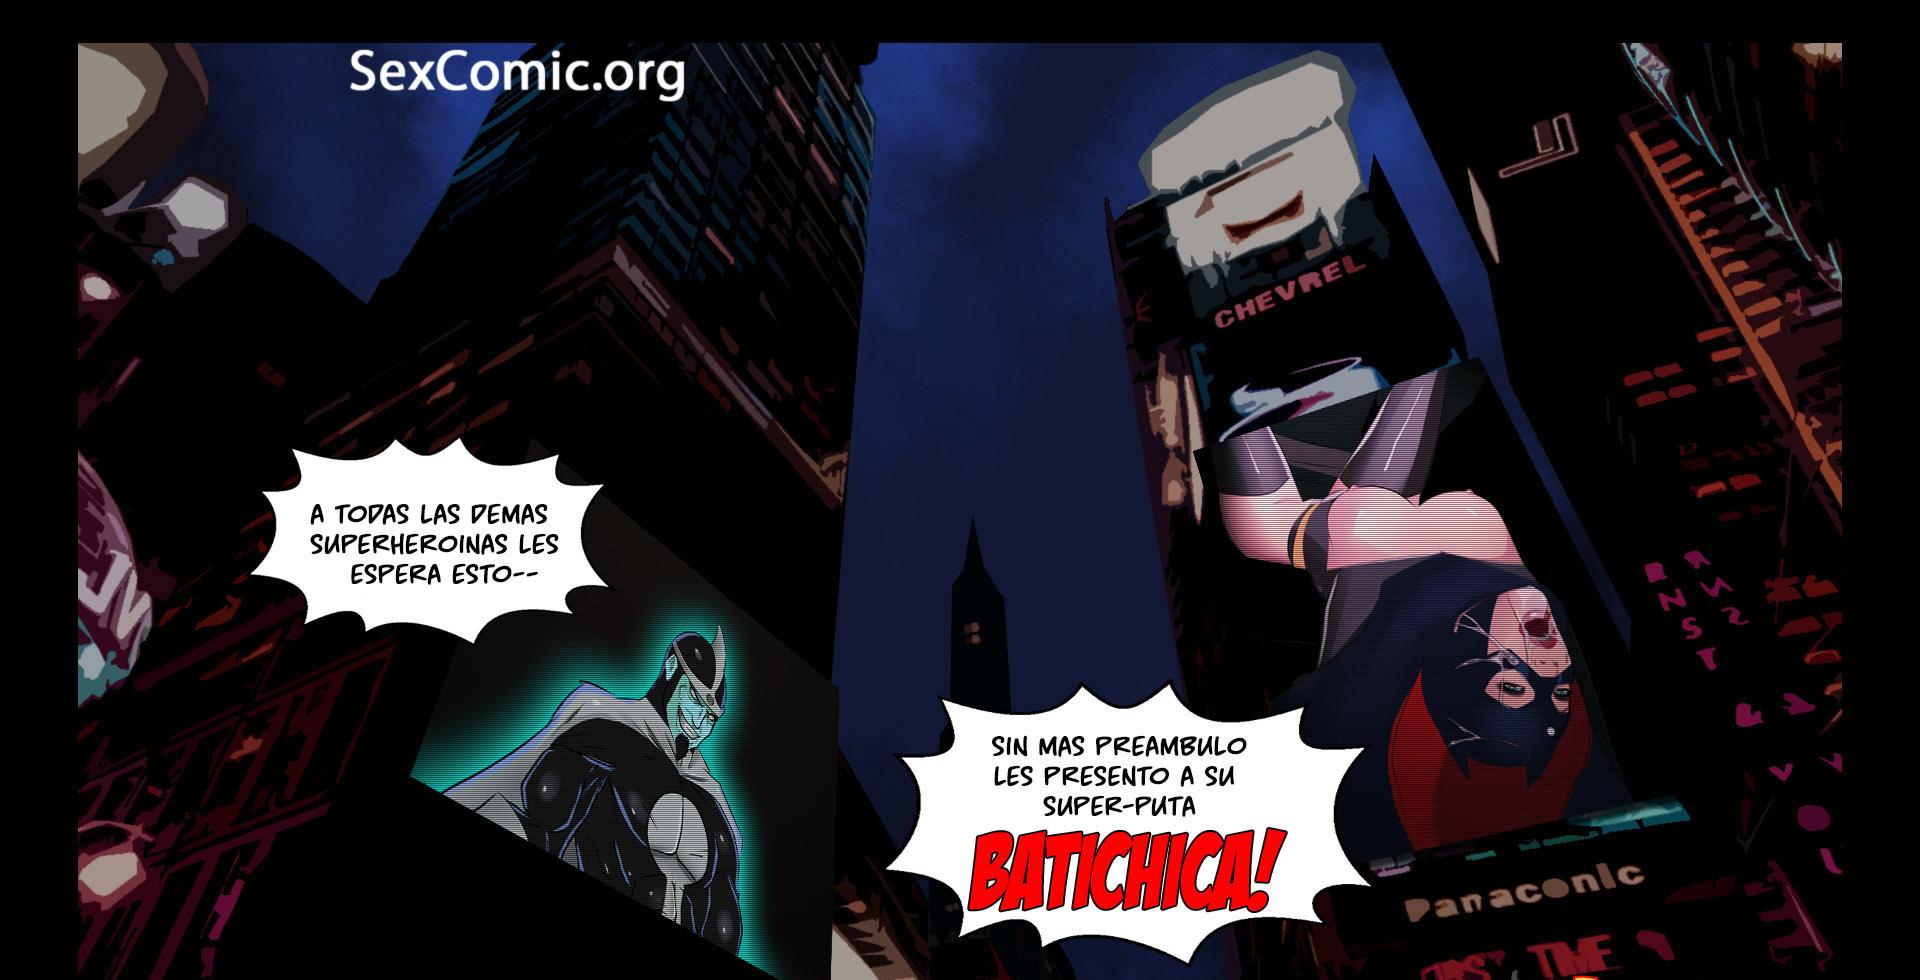 comic-xxx-super-heroes-marvel-historias-eroticas-mangas-sexuales-hentai-videos-pono-comics-de-incesto-gratis-20